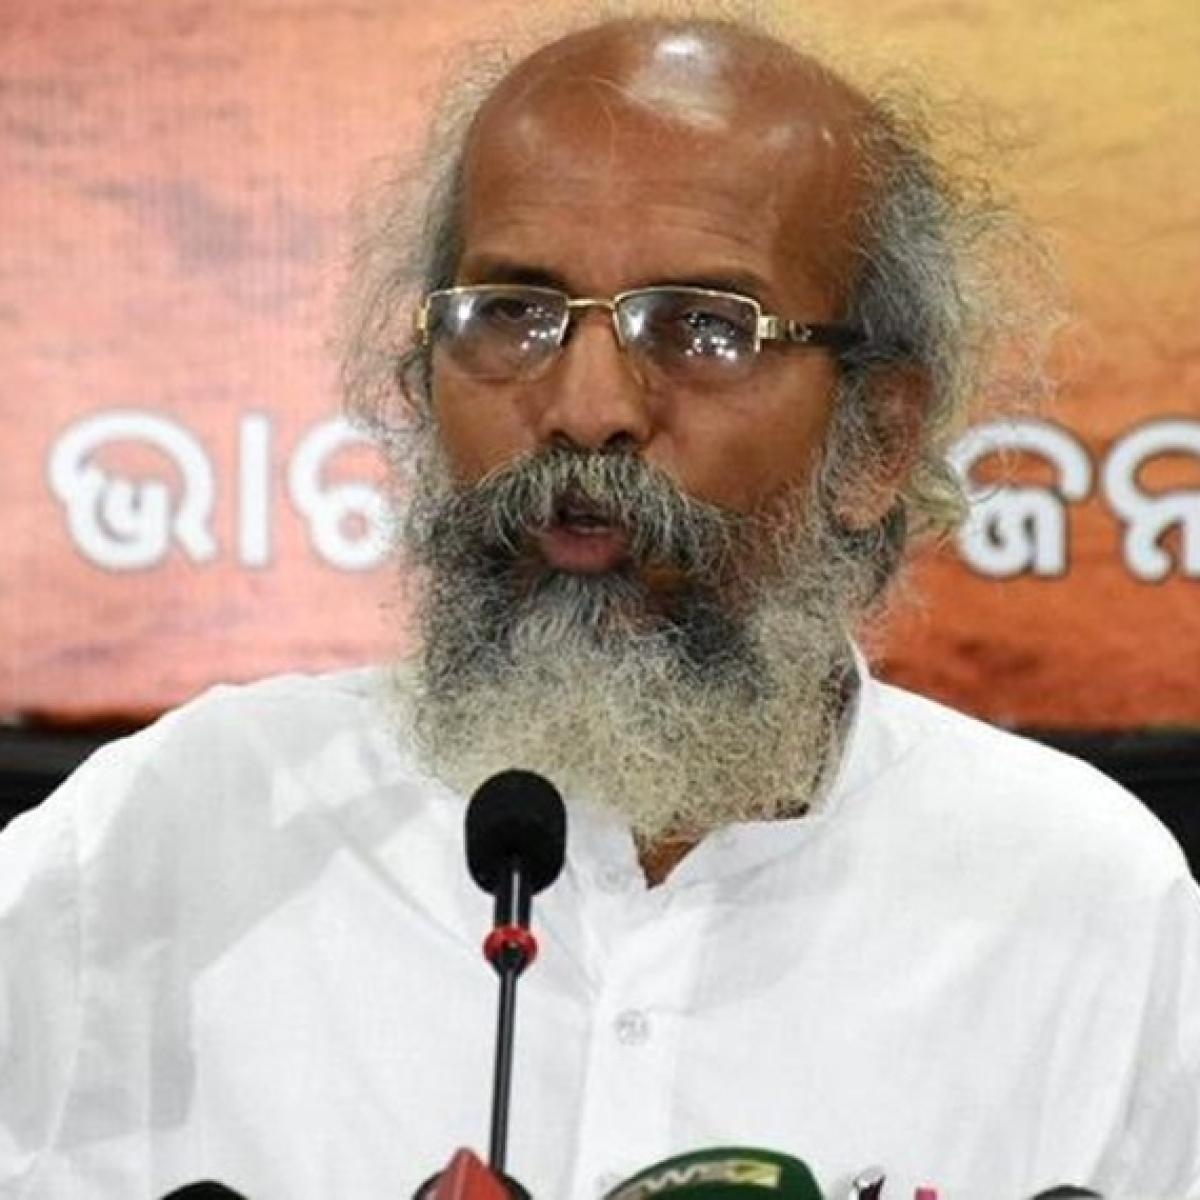 No right to live in India if you don't chant Vande Mataram: Union Minister Pratap Sarangi amid CAA protests